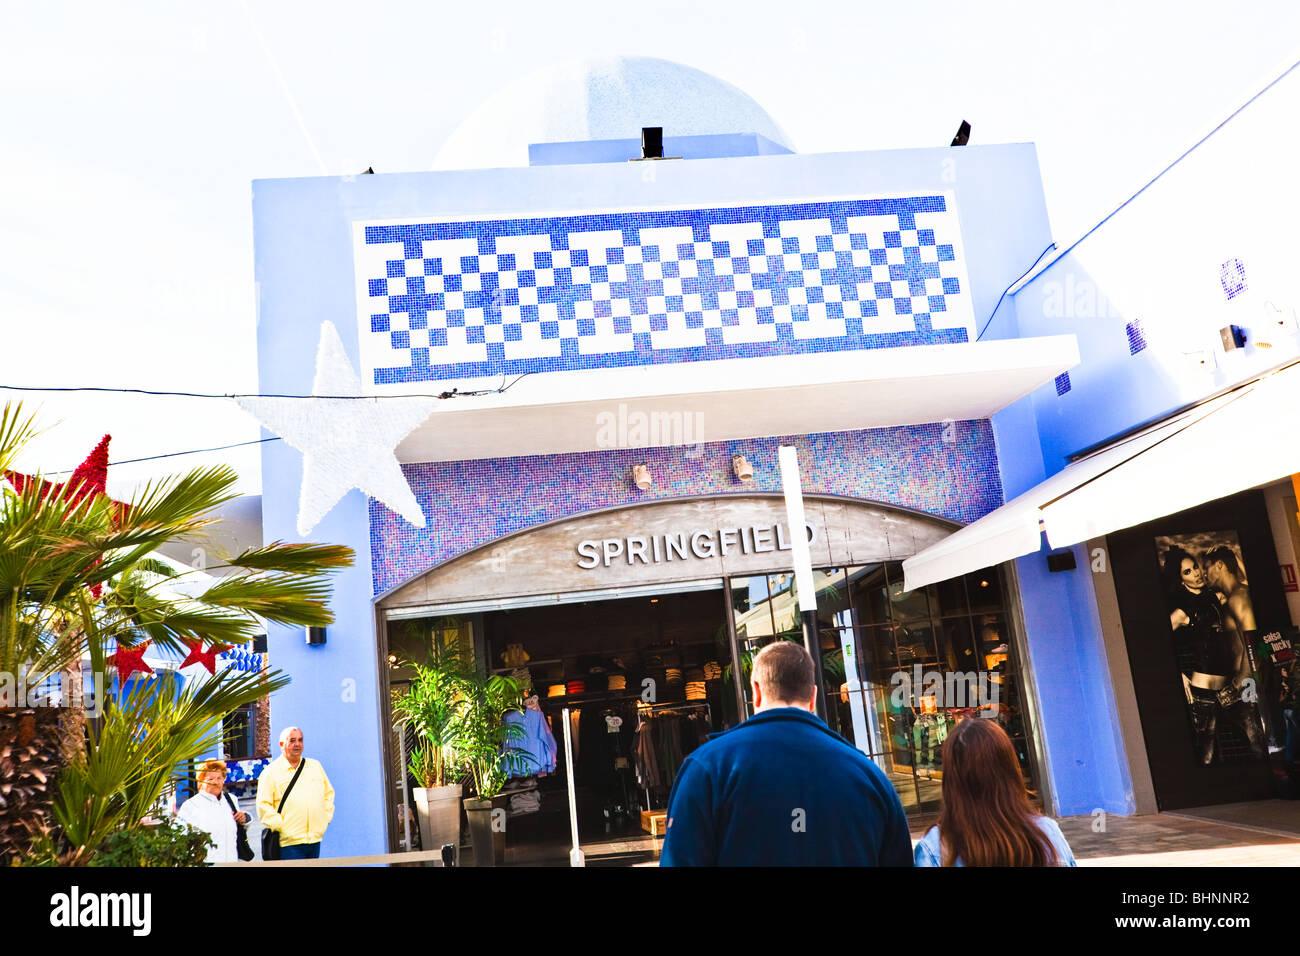 Entrance to Springfield shop at Plaza Mayor shopping centre, Malaga, Costa del Sol, Spain. - Stock Image